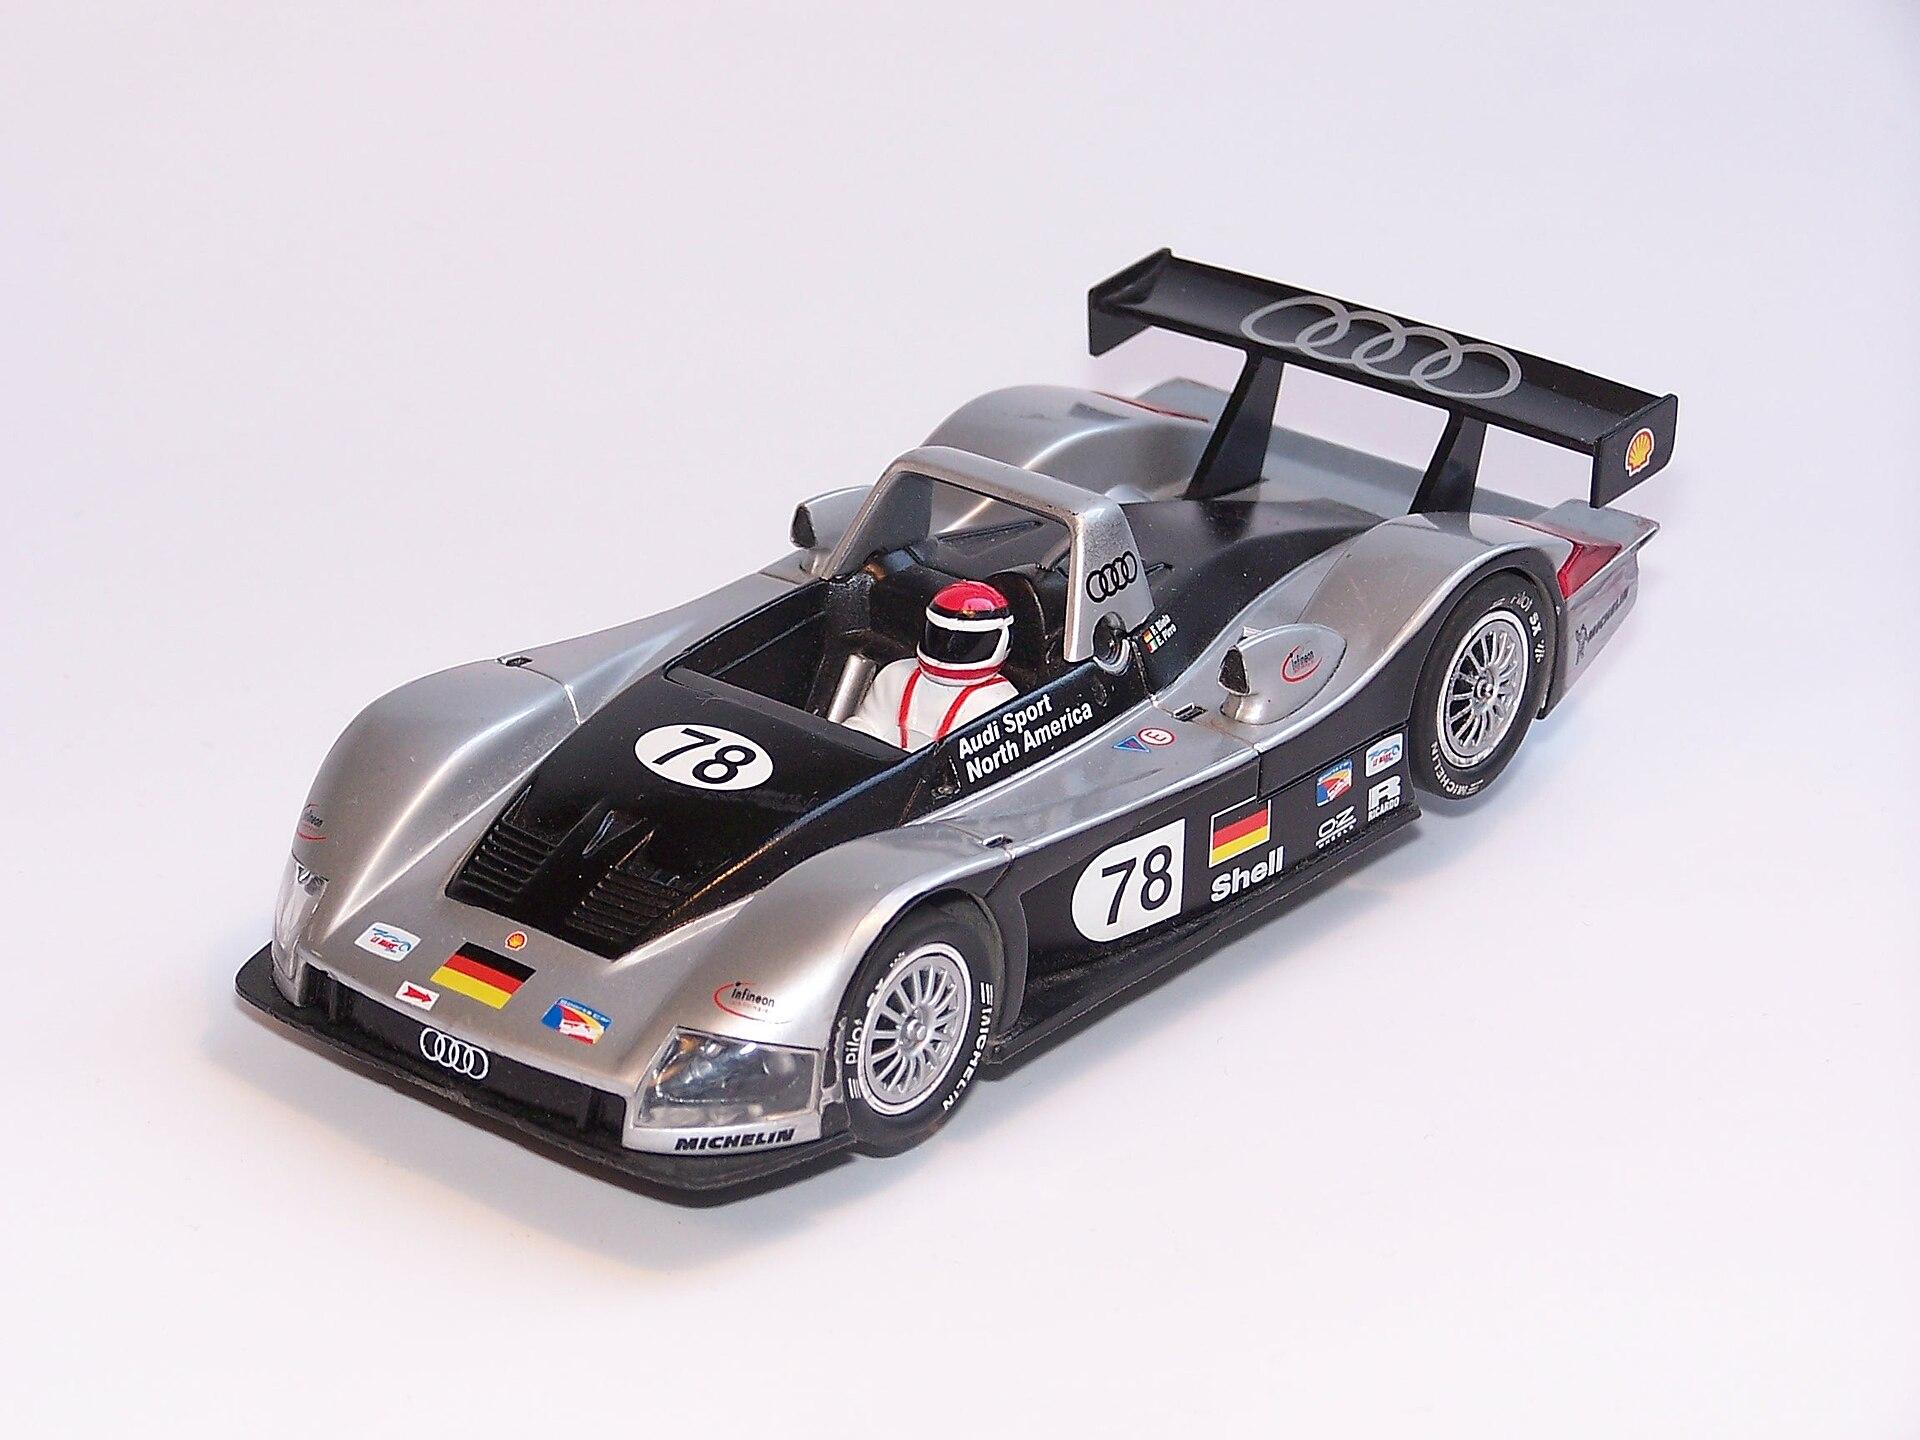 1 32 Slot Car Track Layouts